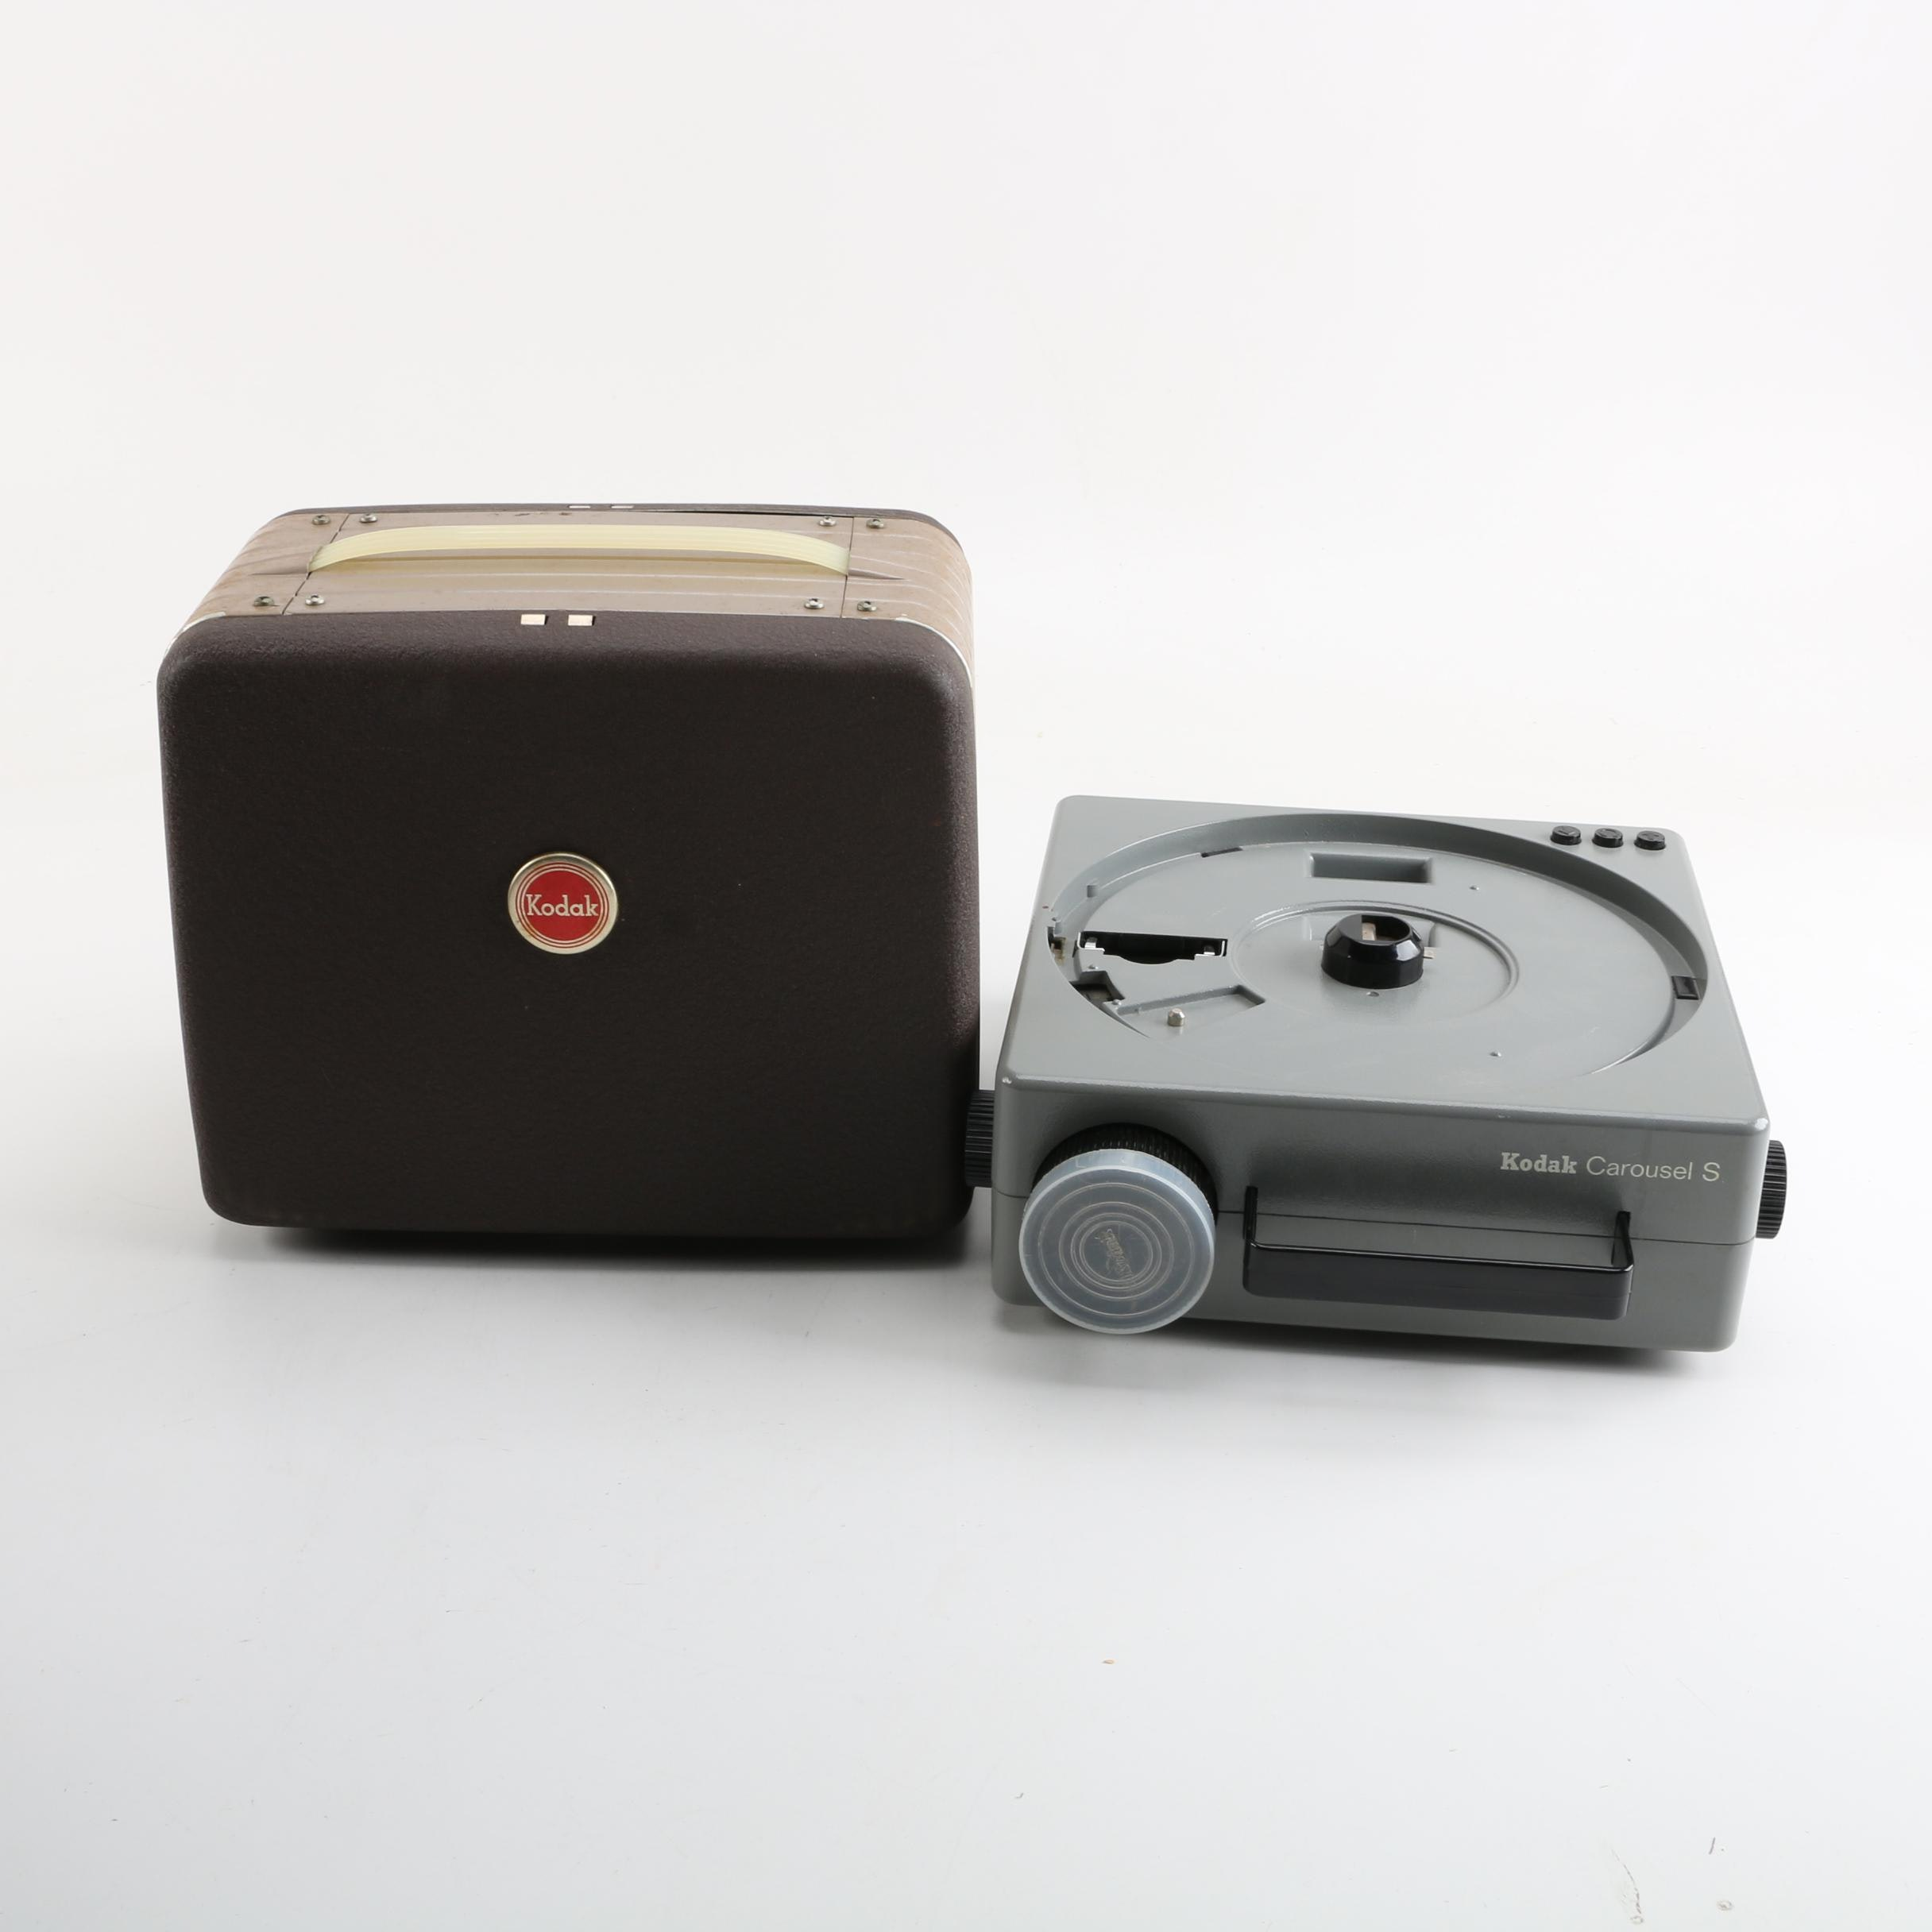 Vintage Kodak Brownie 8mm Movie Projector and Carousel S Slide Projector